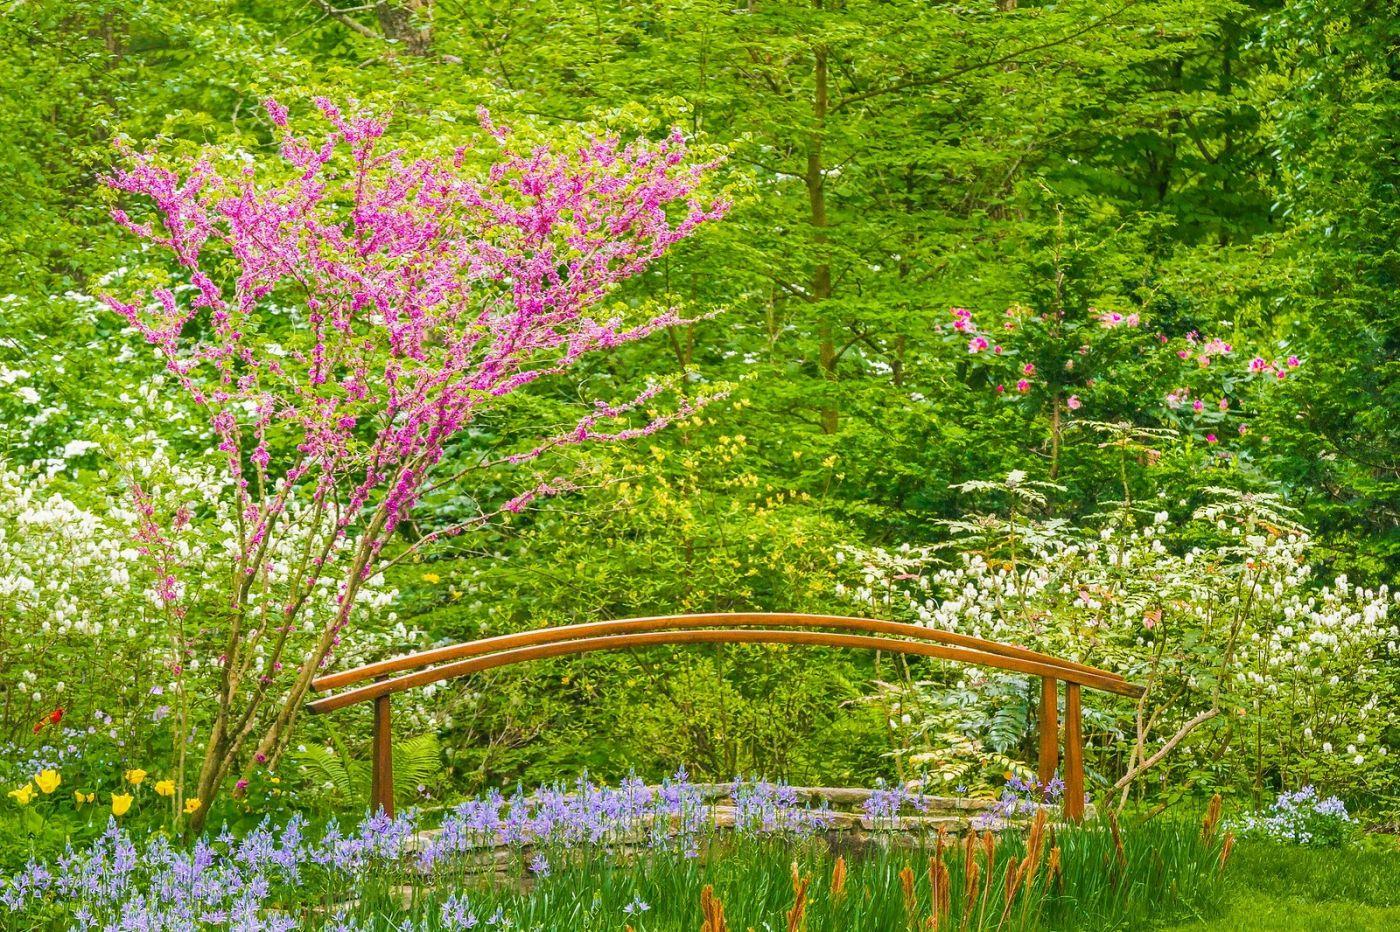 Chanticleer花园,有梦想的季节_图1-18